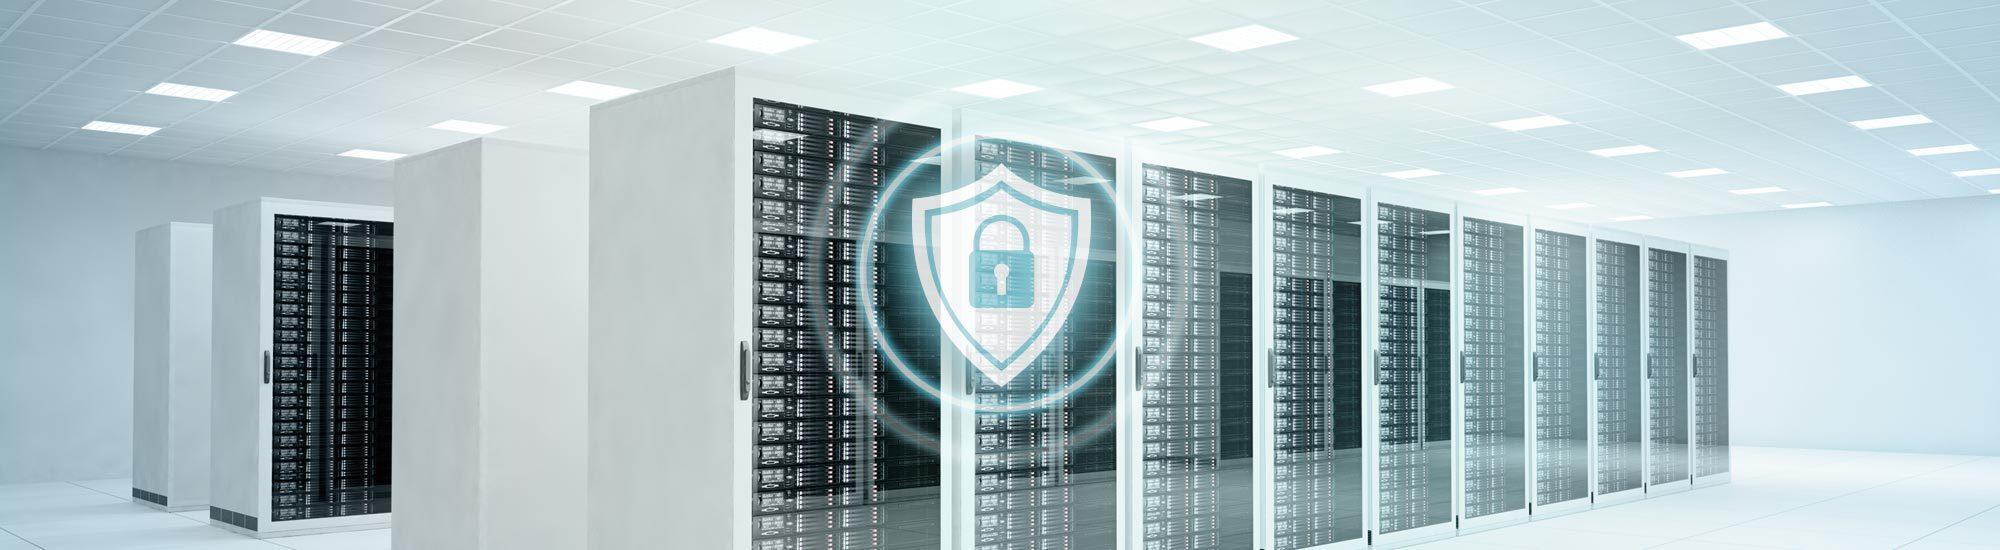 Datenschutz | advasco GmbH